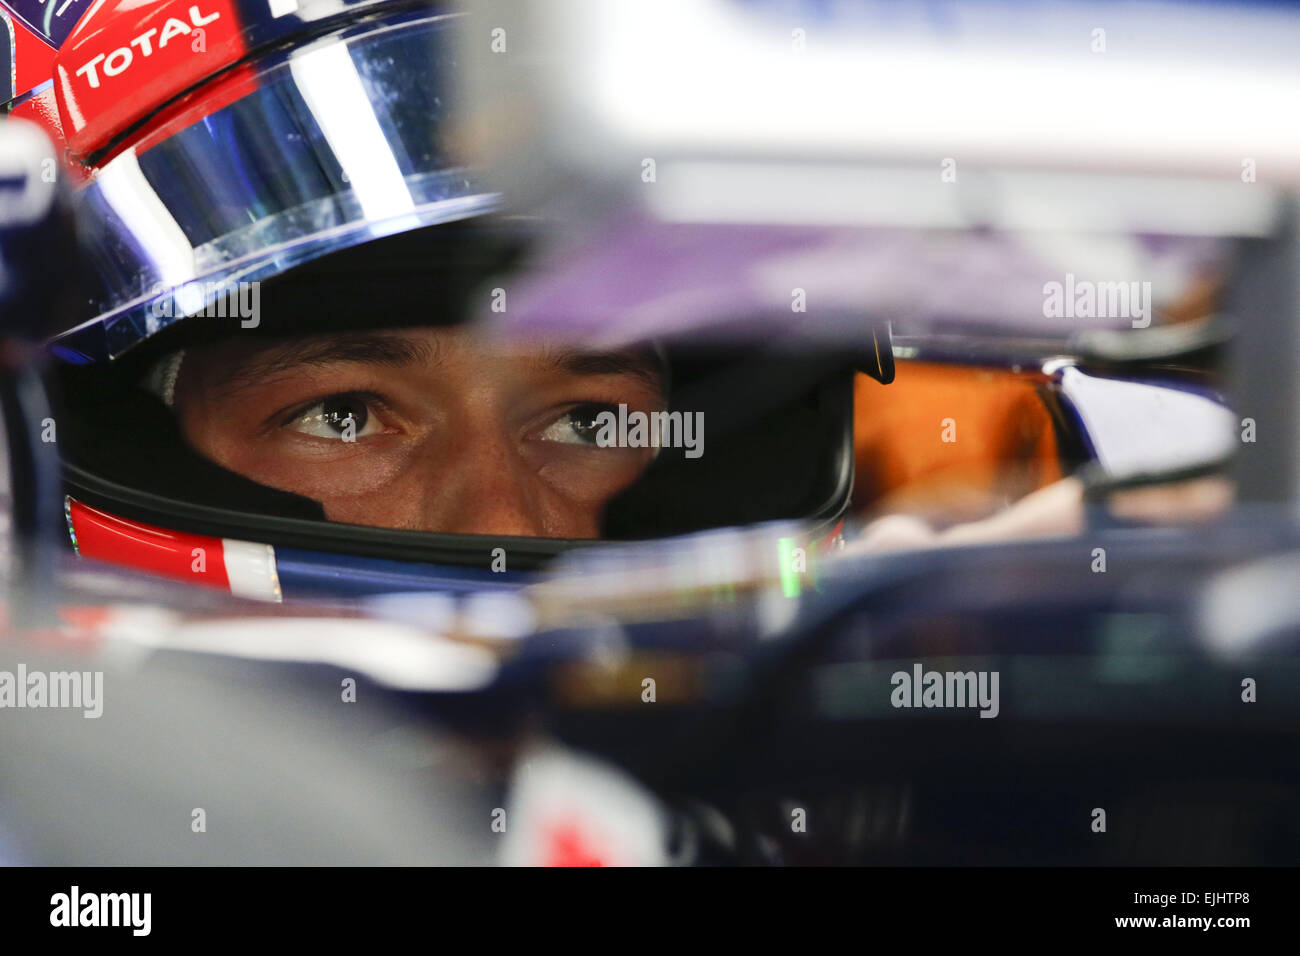 Sepang, Malaysia. 27. März 2015. DANIIL KVYAT Russlands und Infiniti Red Bull Racing gilt im im Auto zu sitzen, Stockbild